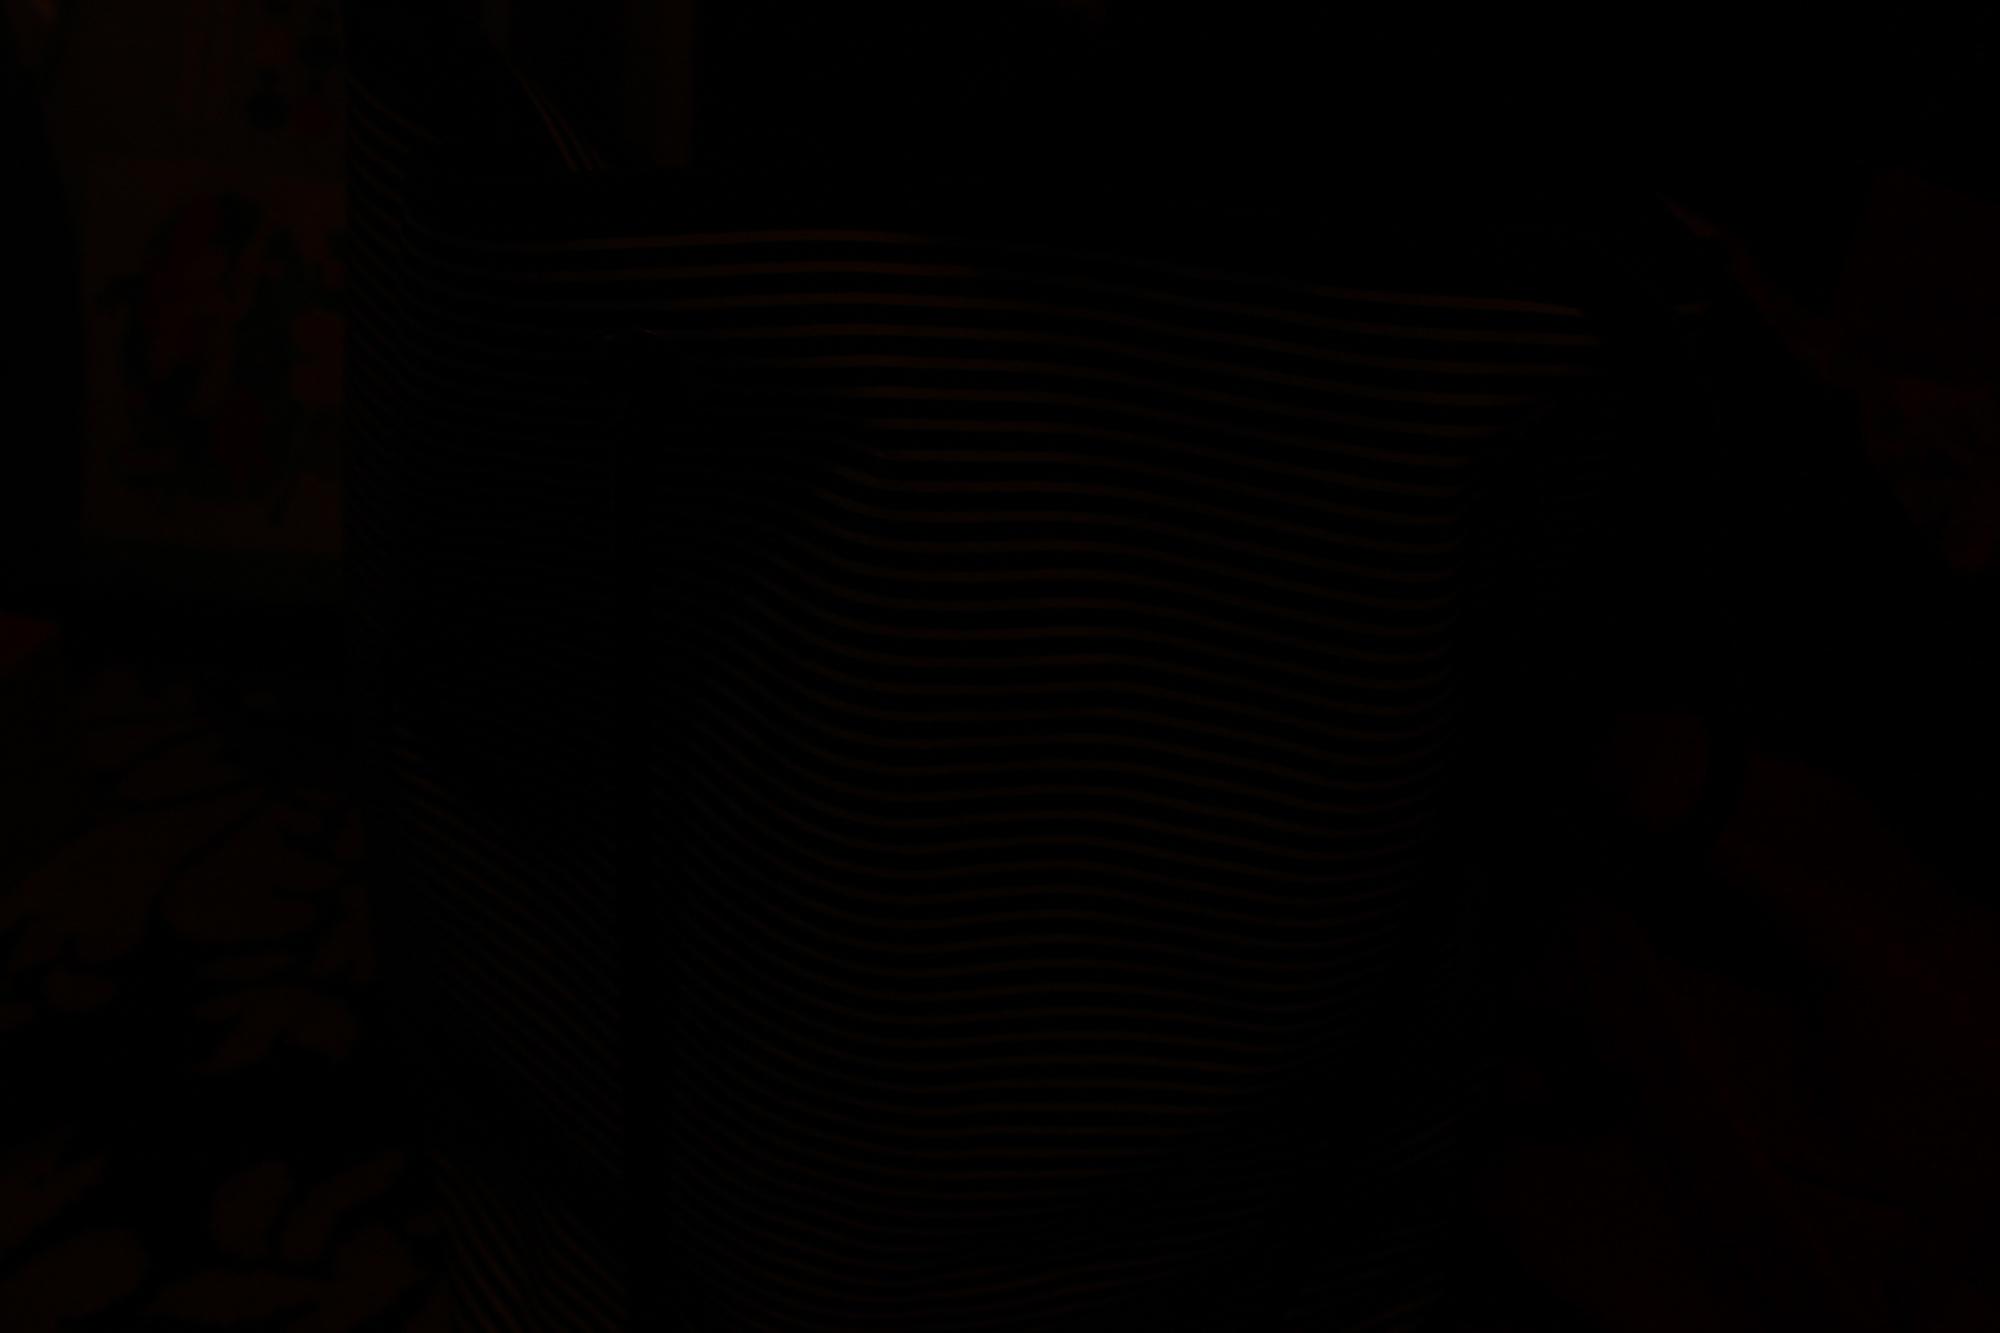 Black-Background-DX58.jpg